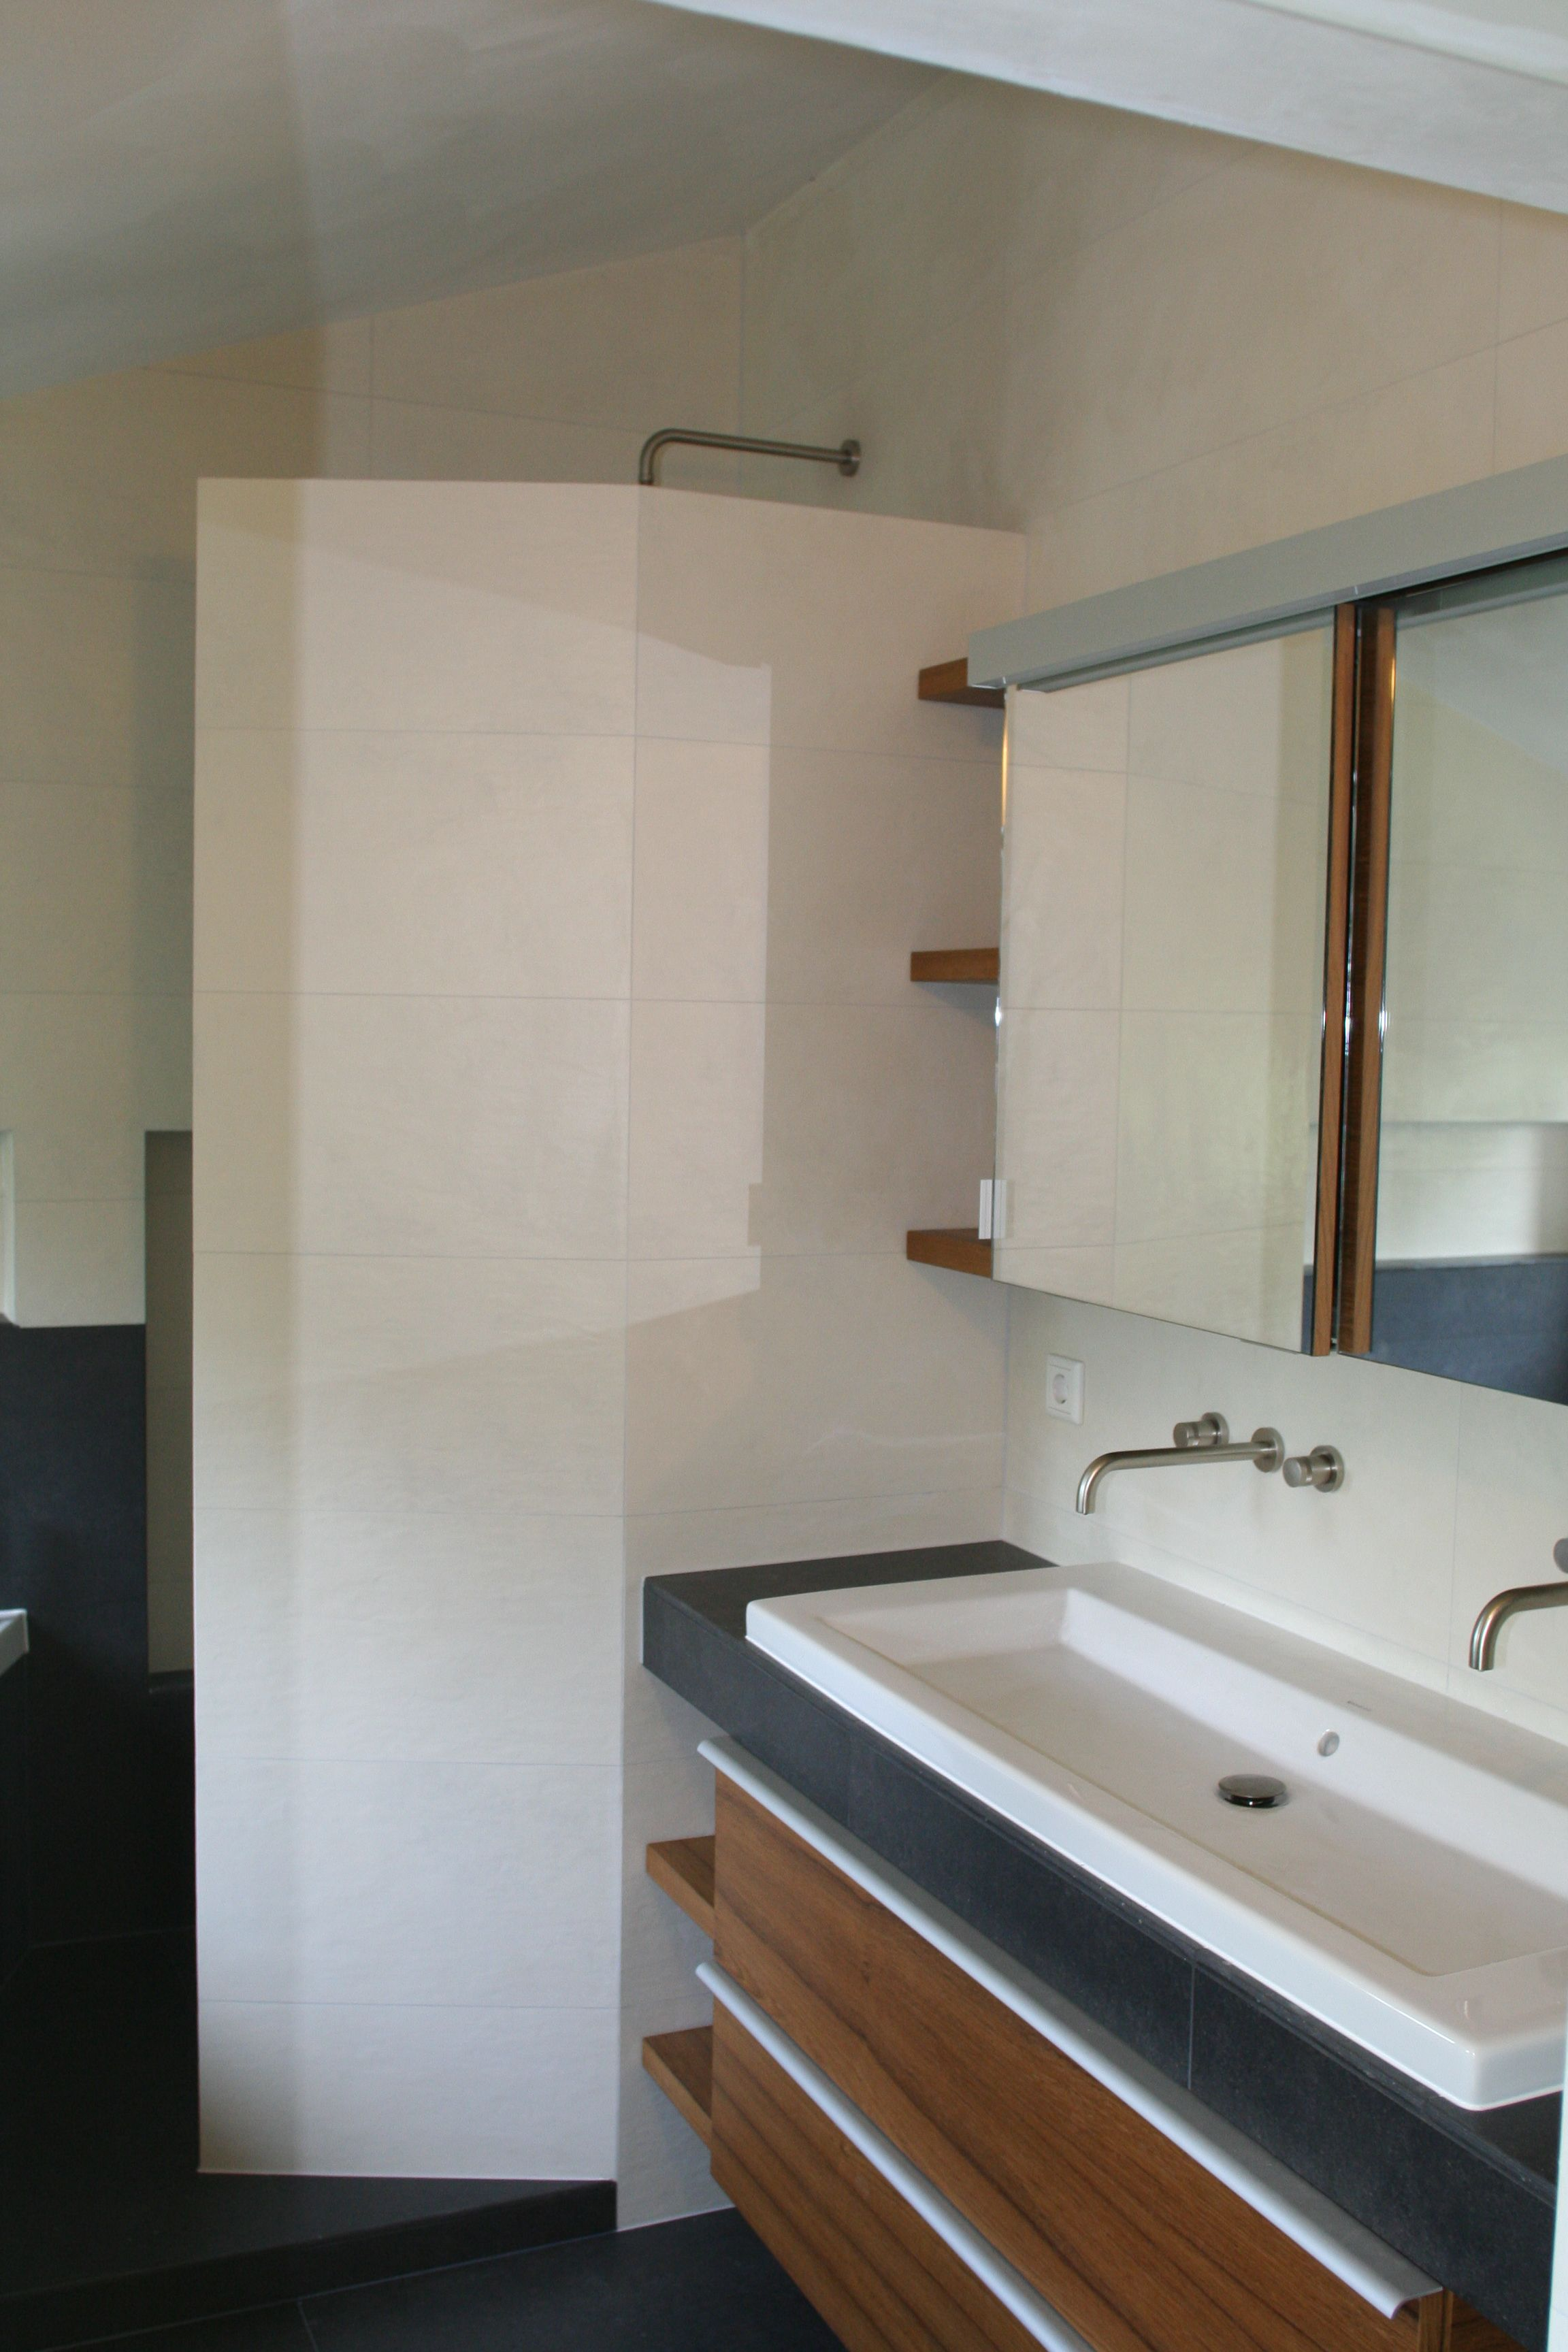 Moderne badkamer met inloopdouche. Badkamer ideeën / Bathroom ideas ...